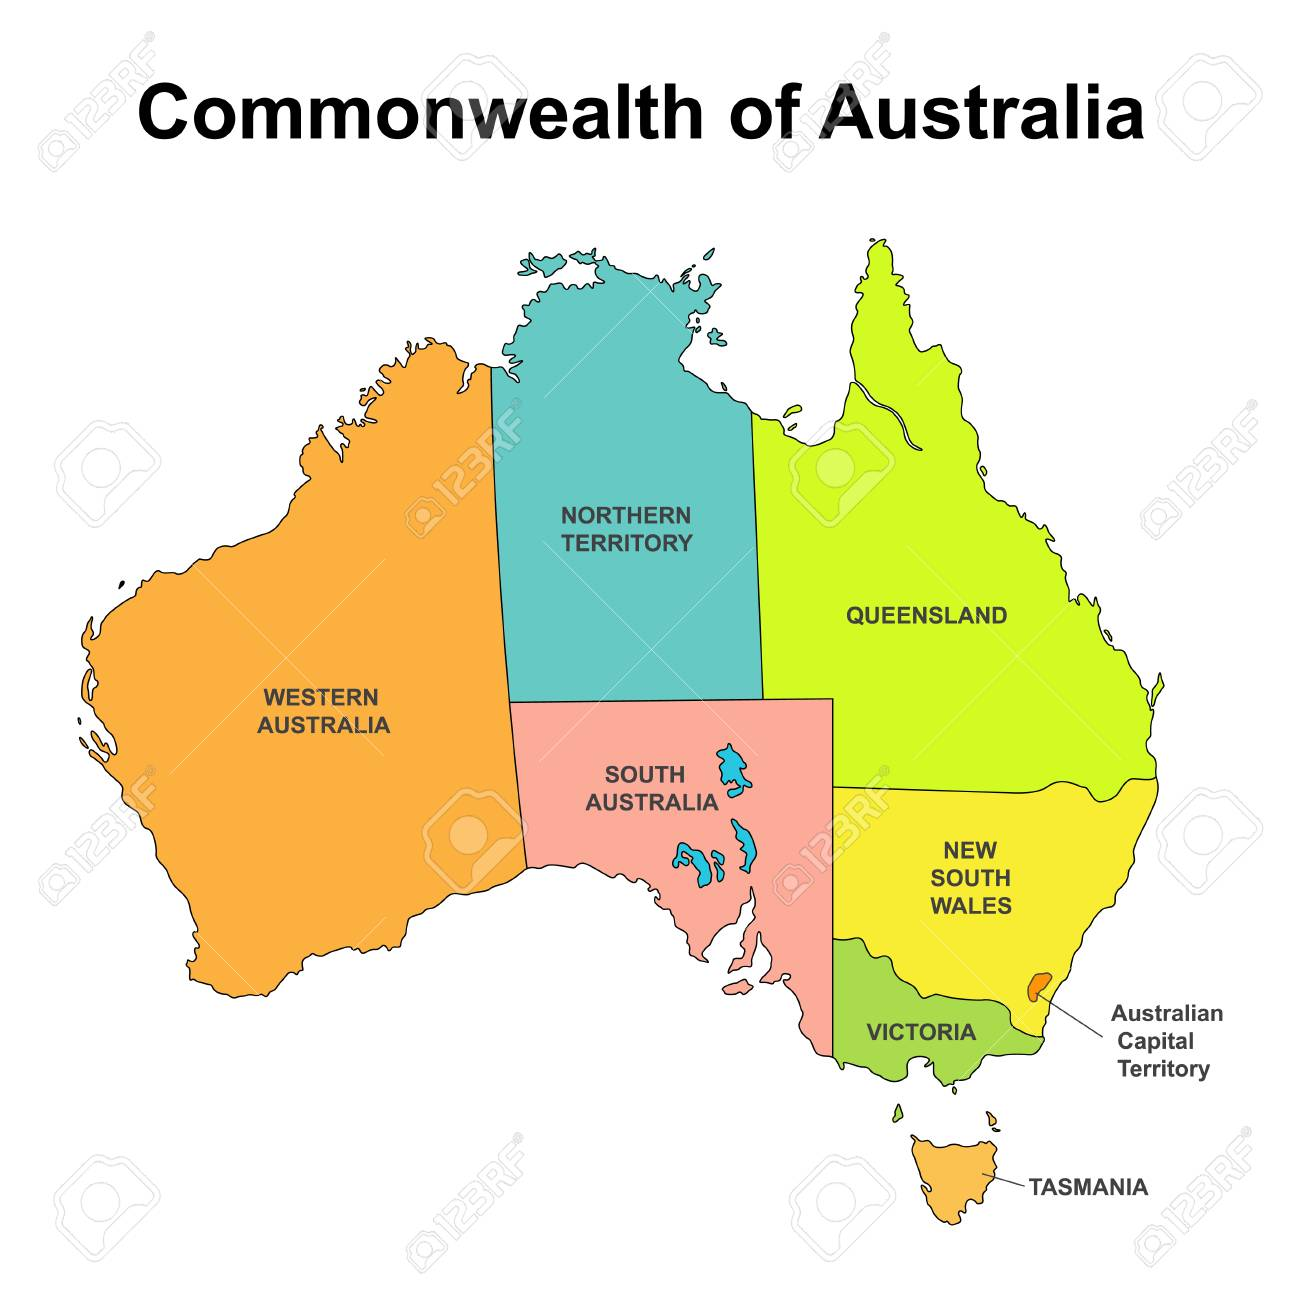 Map Of Australia Regions.Map Of Australia With Internal Regional Boundaries Vector Illustration